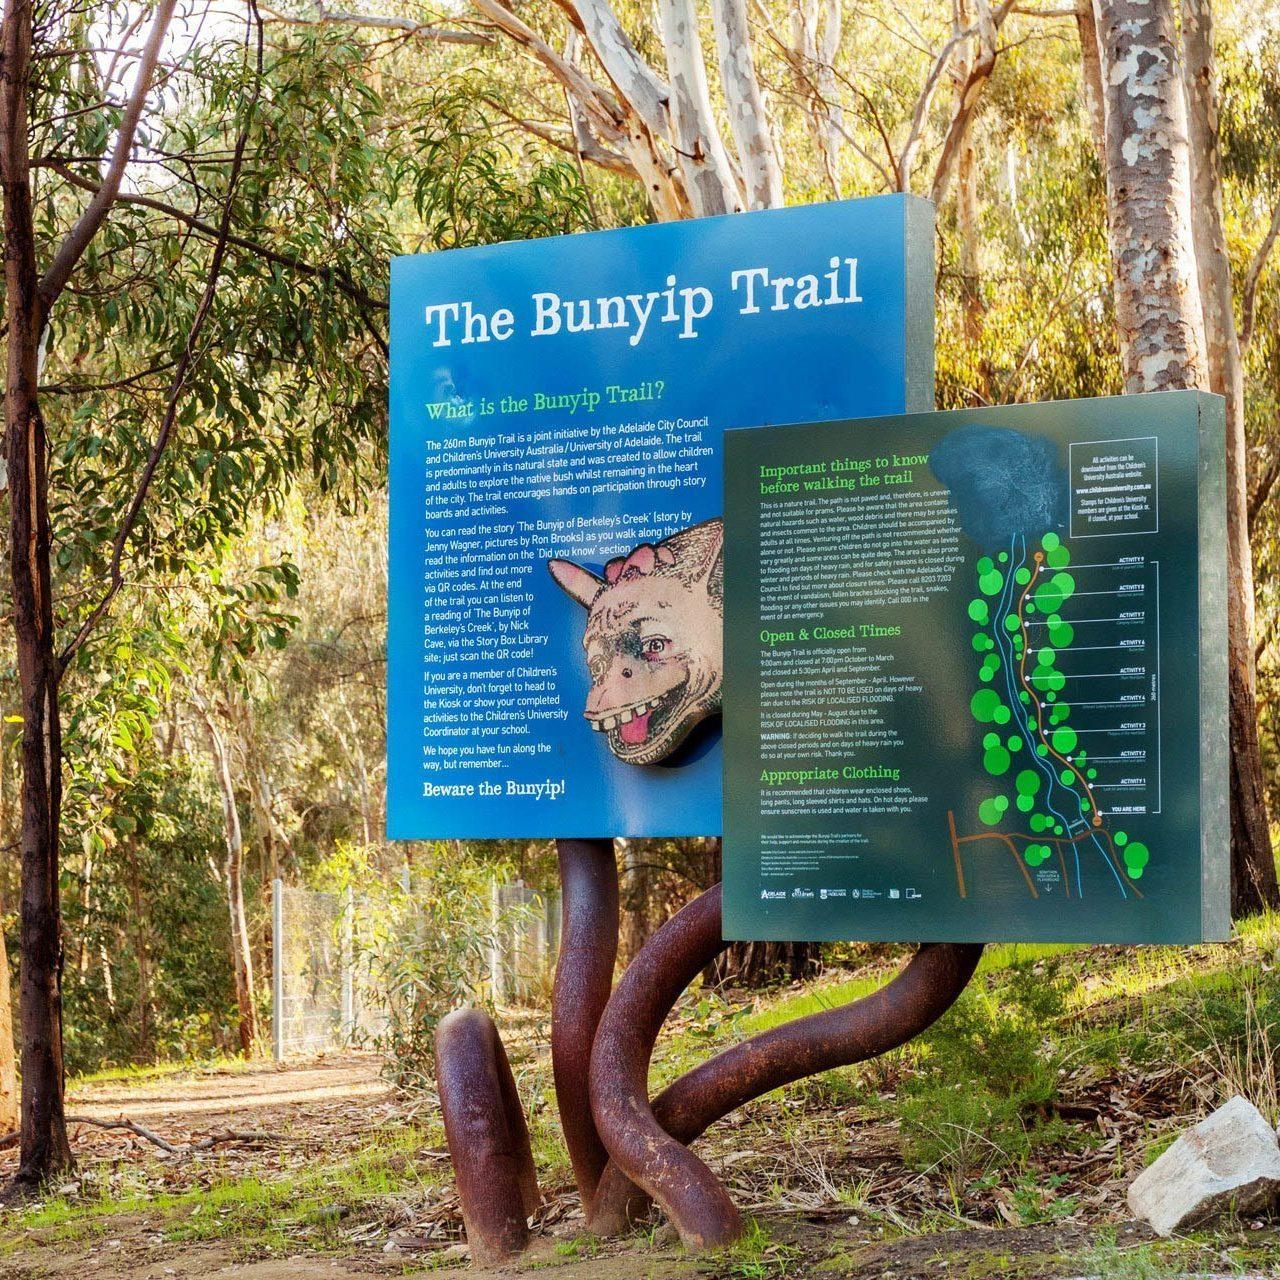 Bunyip trail biodiversity